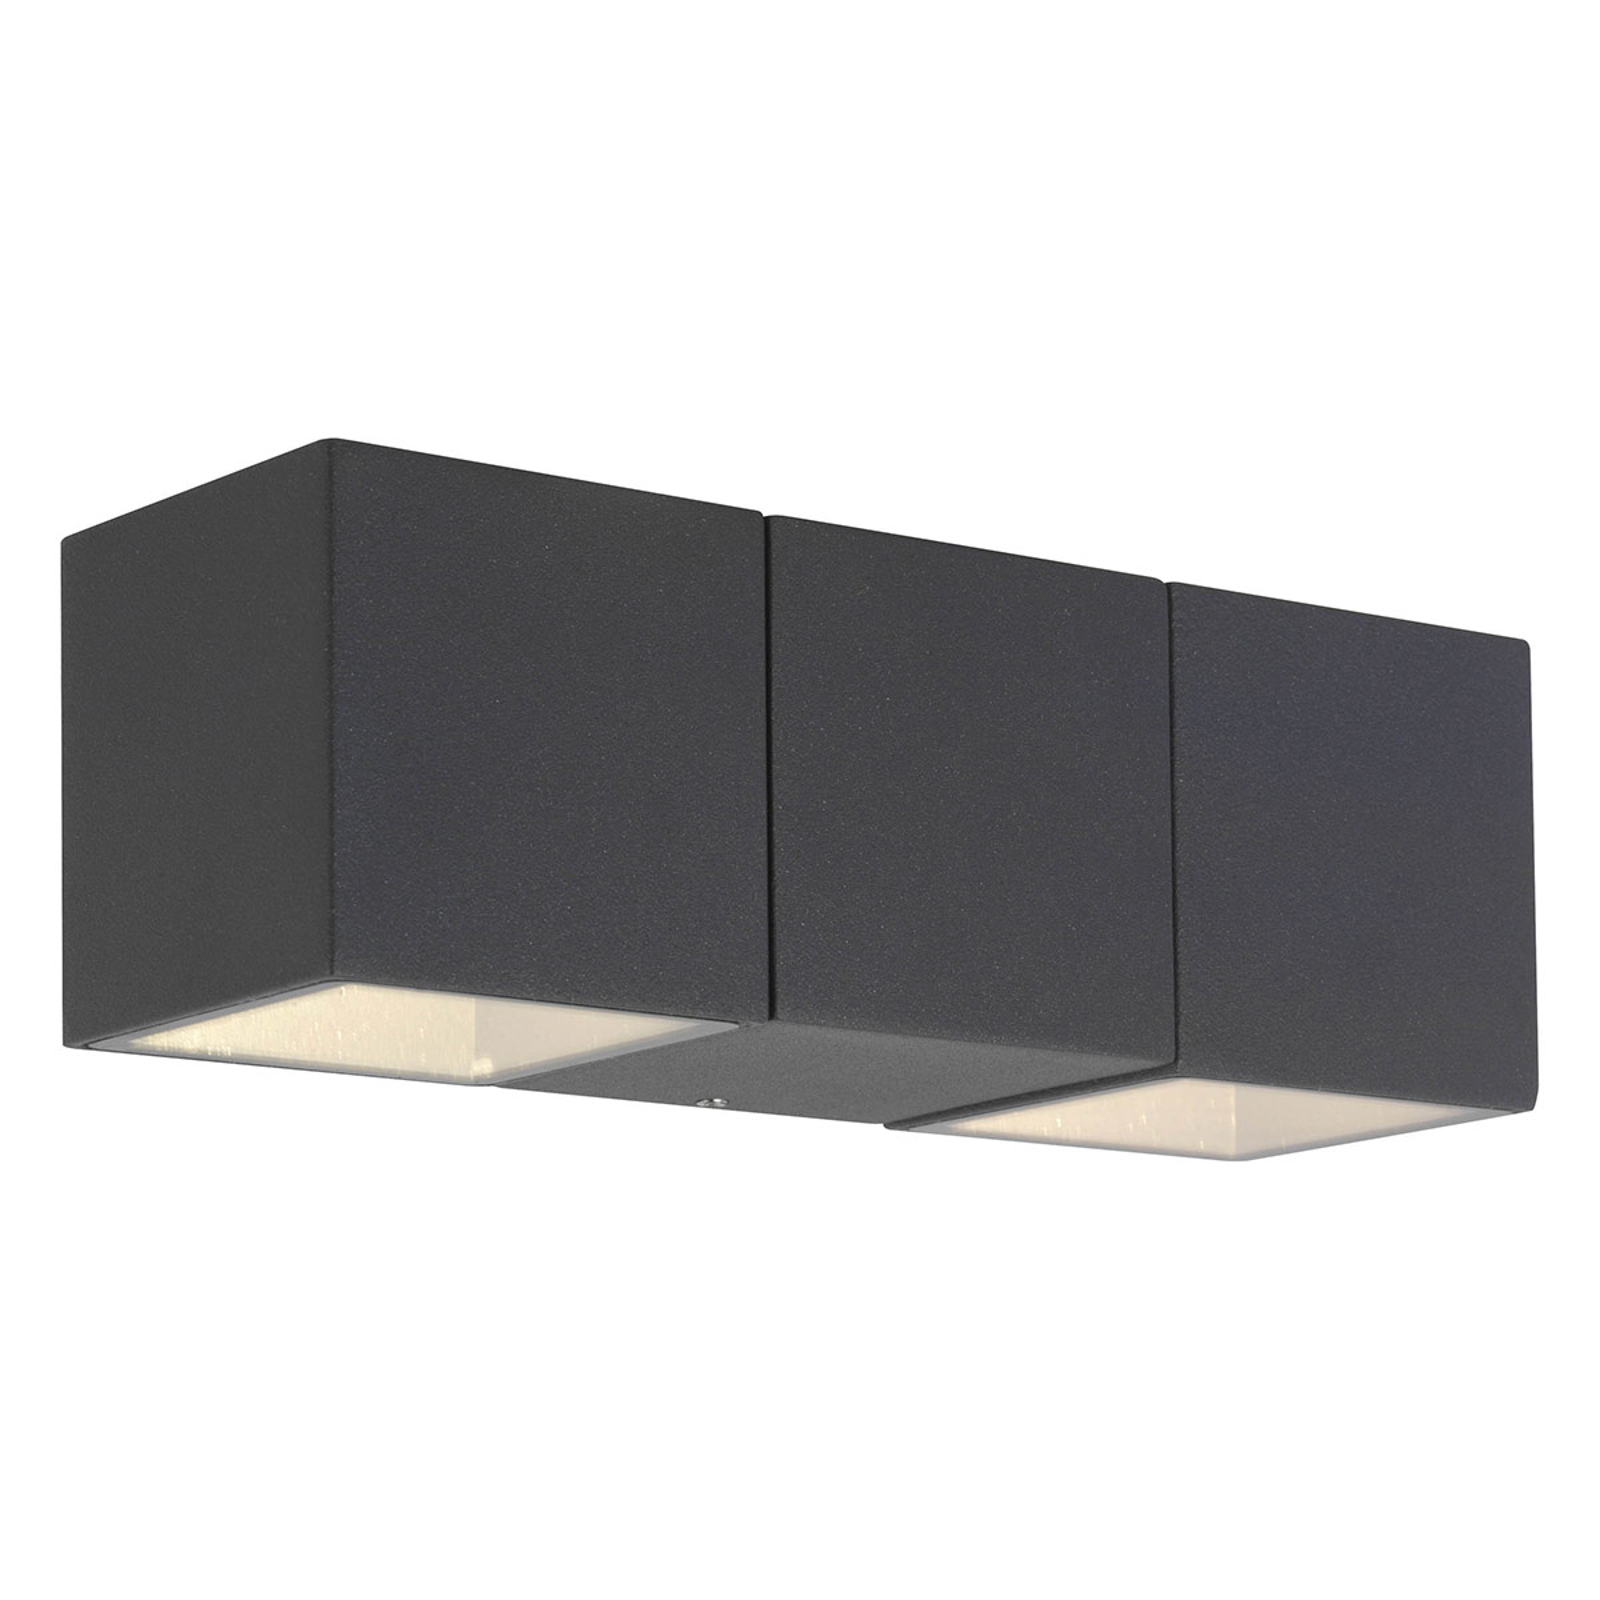 AEG Daveen LED buitenwandlamp 2-lamps